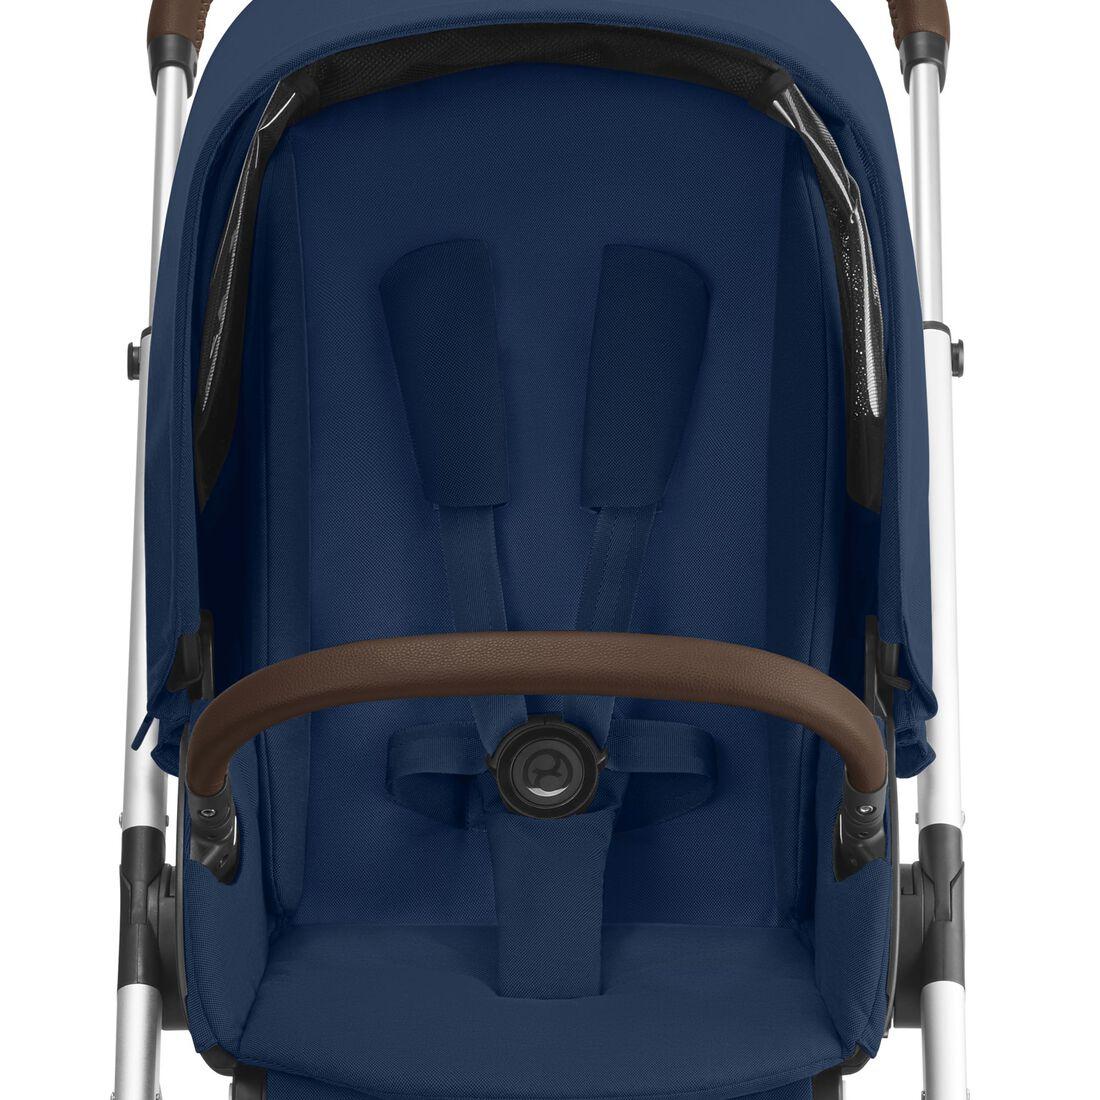 CYBEX Talos S Lux - Navy Blue (Silberner Rahmen) in Navy Blue (Silver Frame) large Bild 3